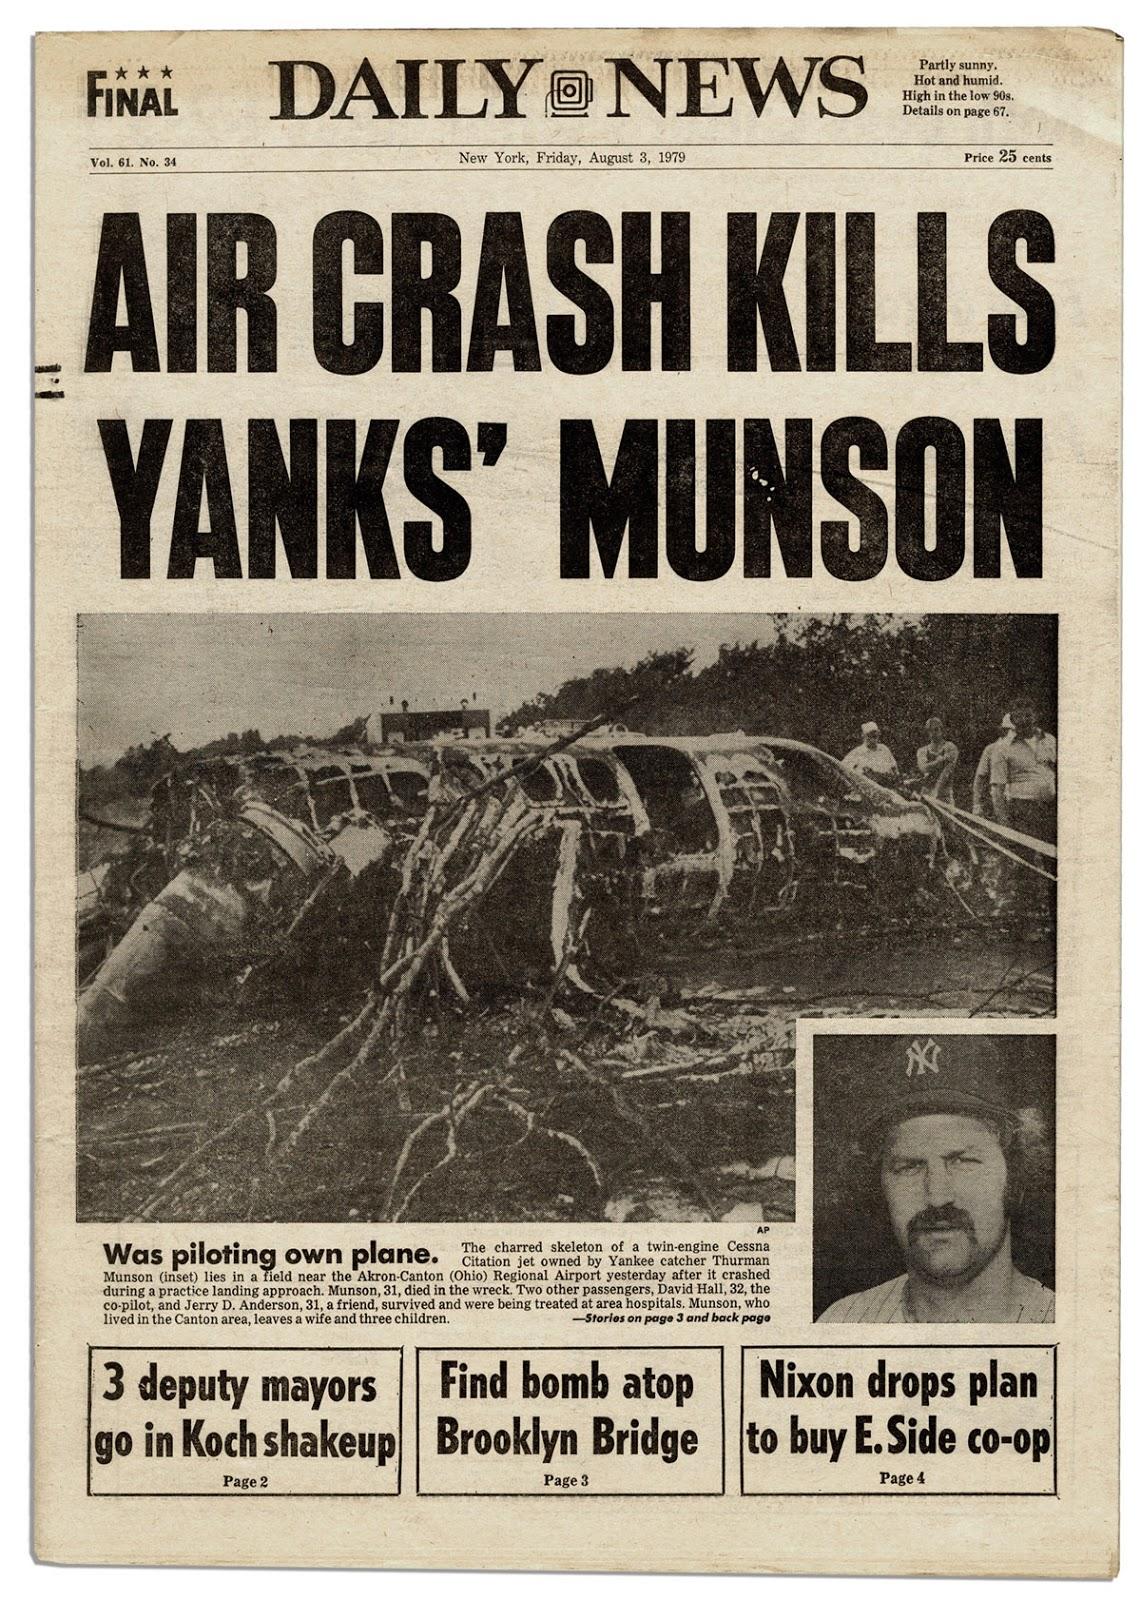 Daily News Aug 3, 1979 Thurman Munson plane crash